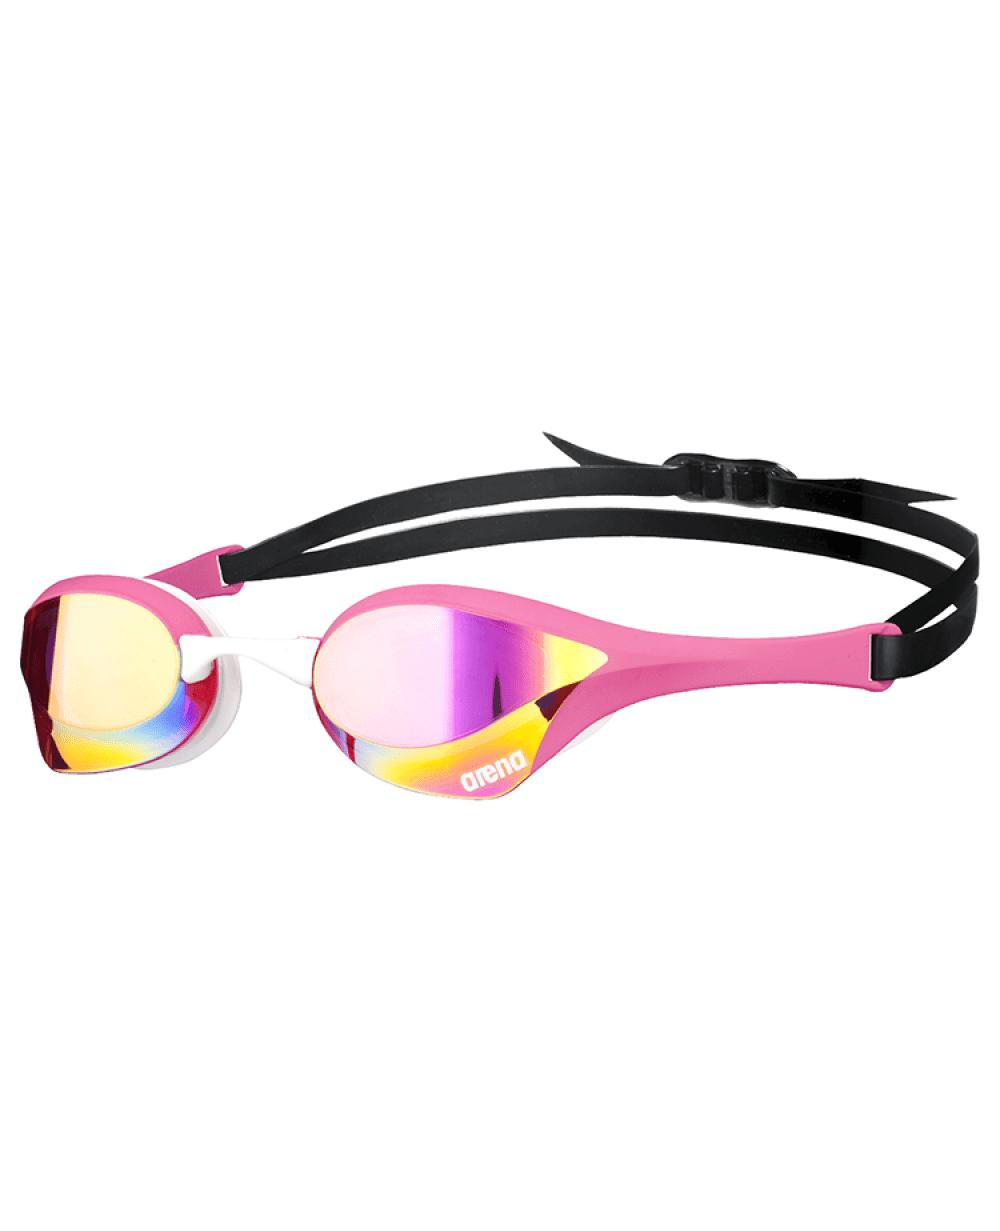 Arena zwembril Cobra Ultra Mirror pink-revo/pink/white